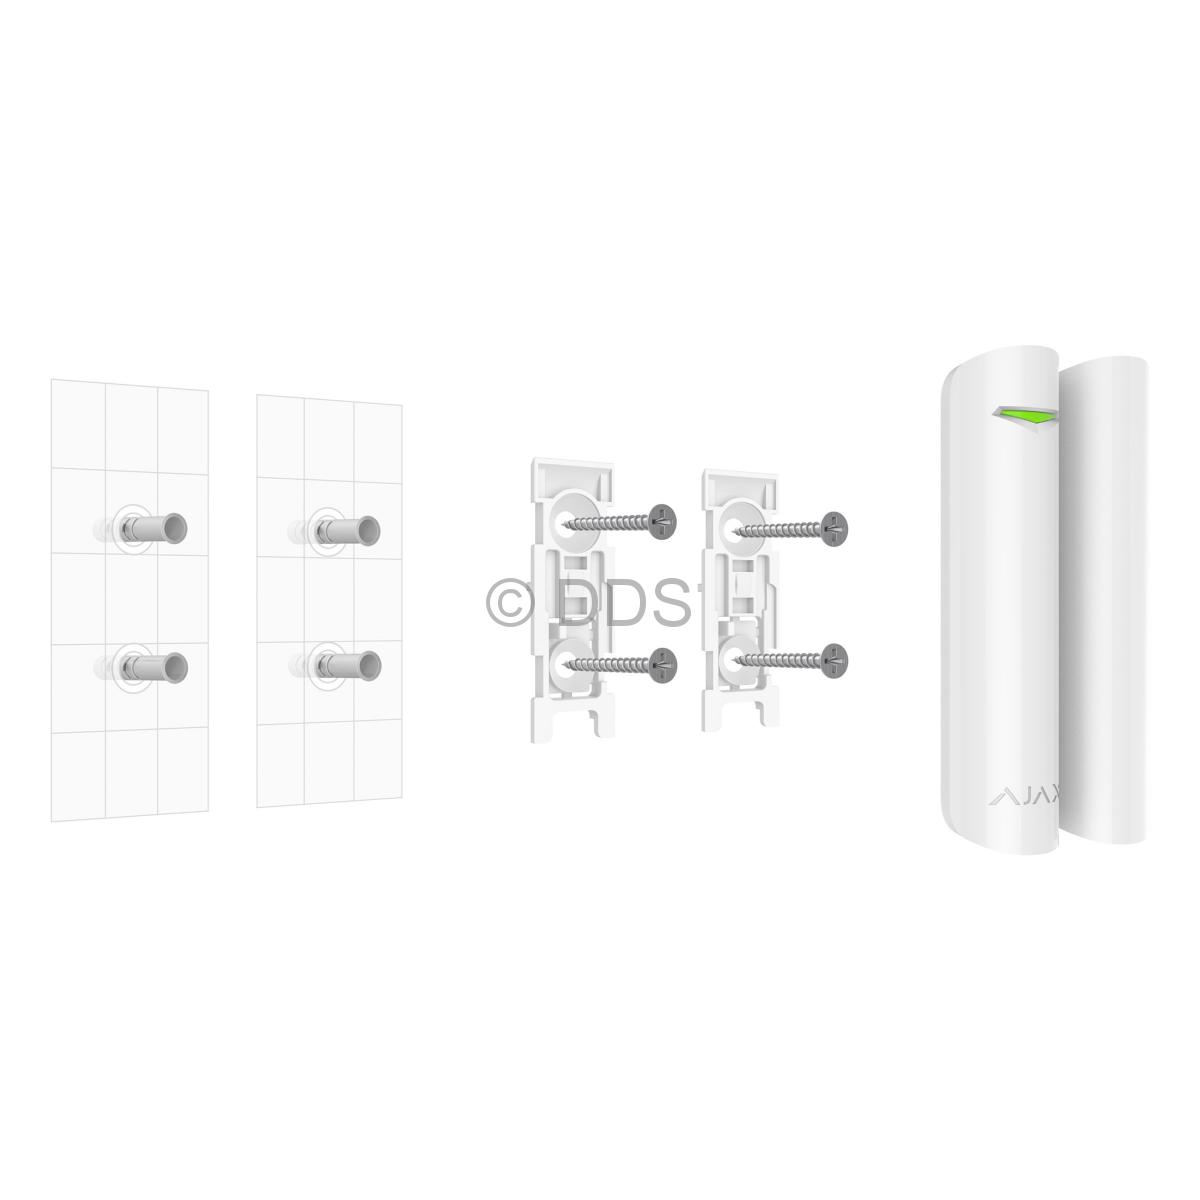 Installation of the Ajax DoorProtect Plus Opening Detector